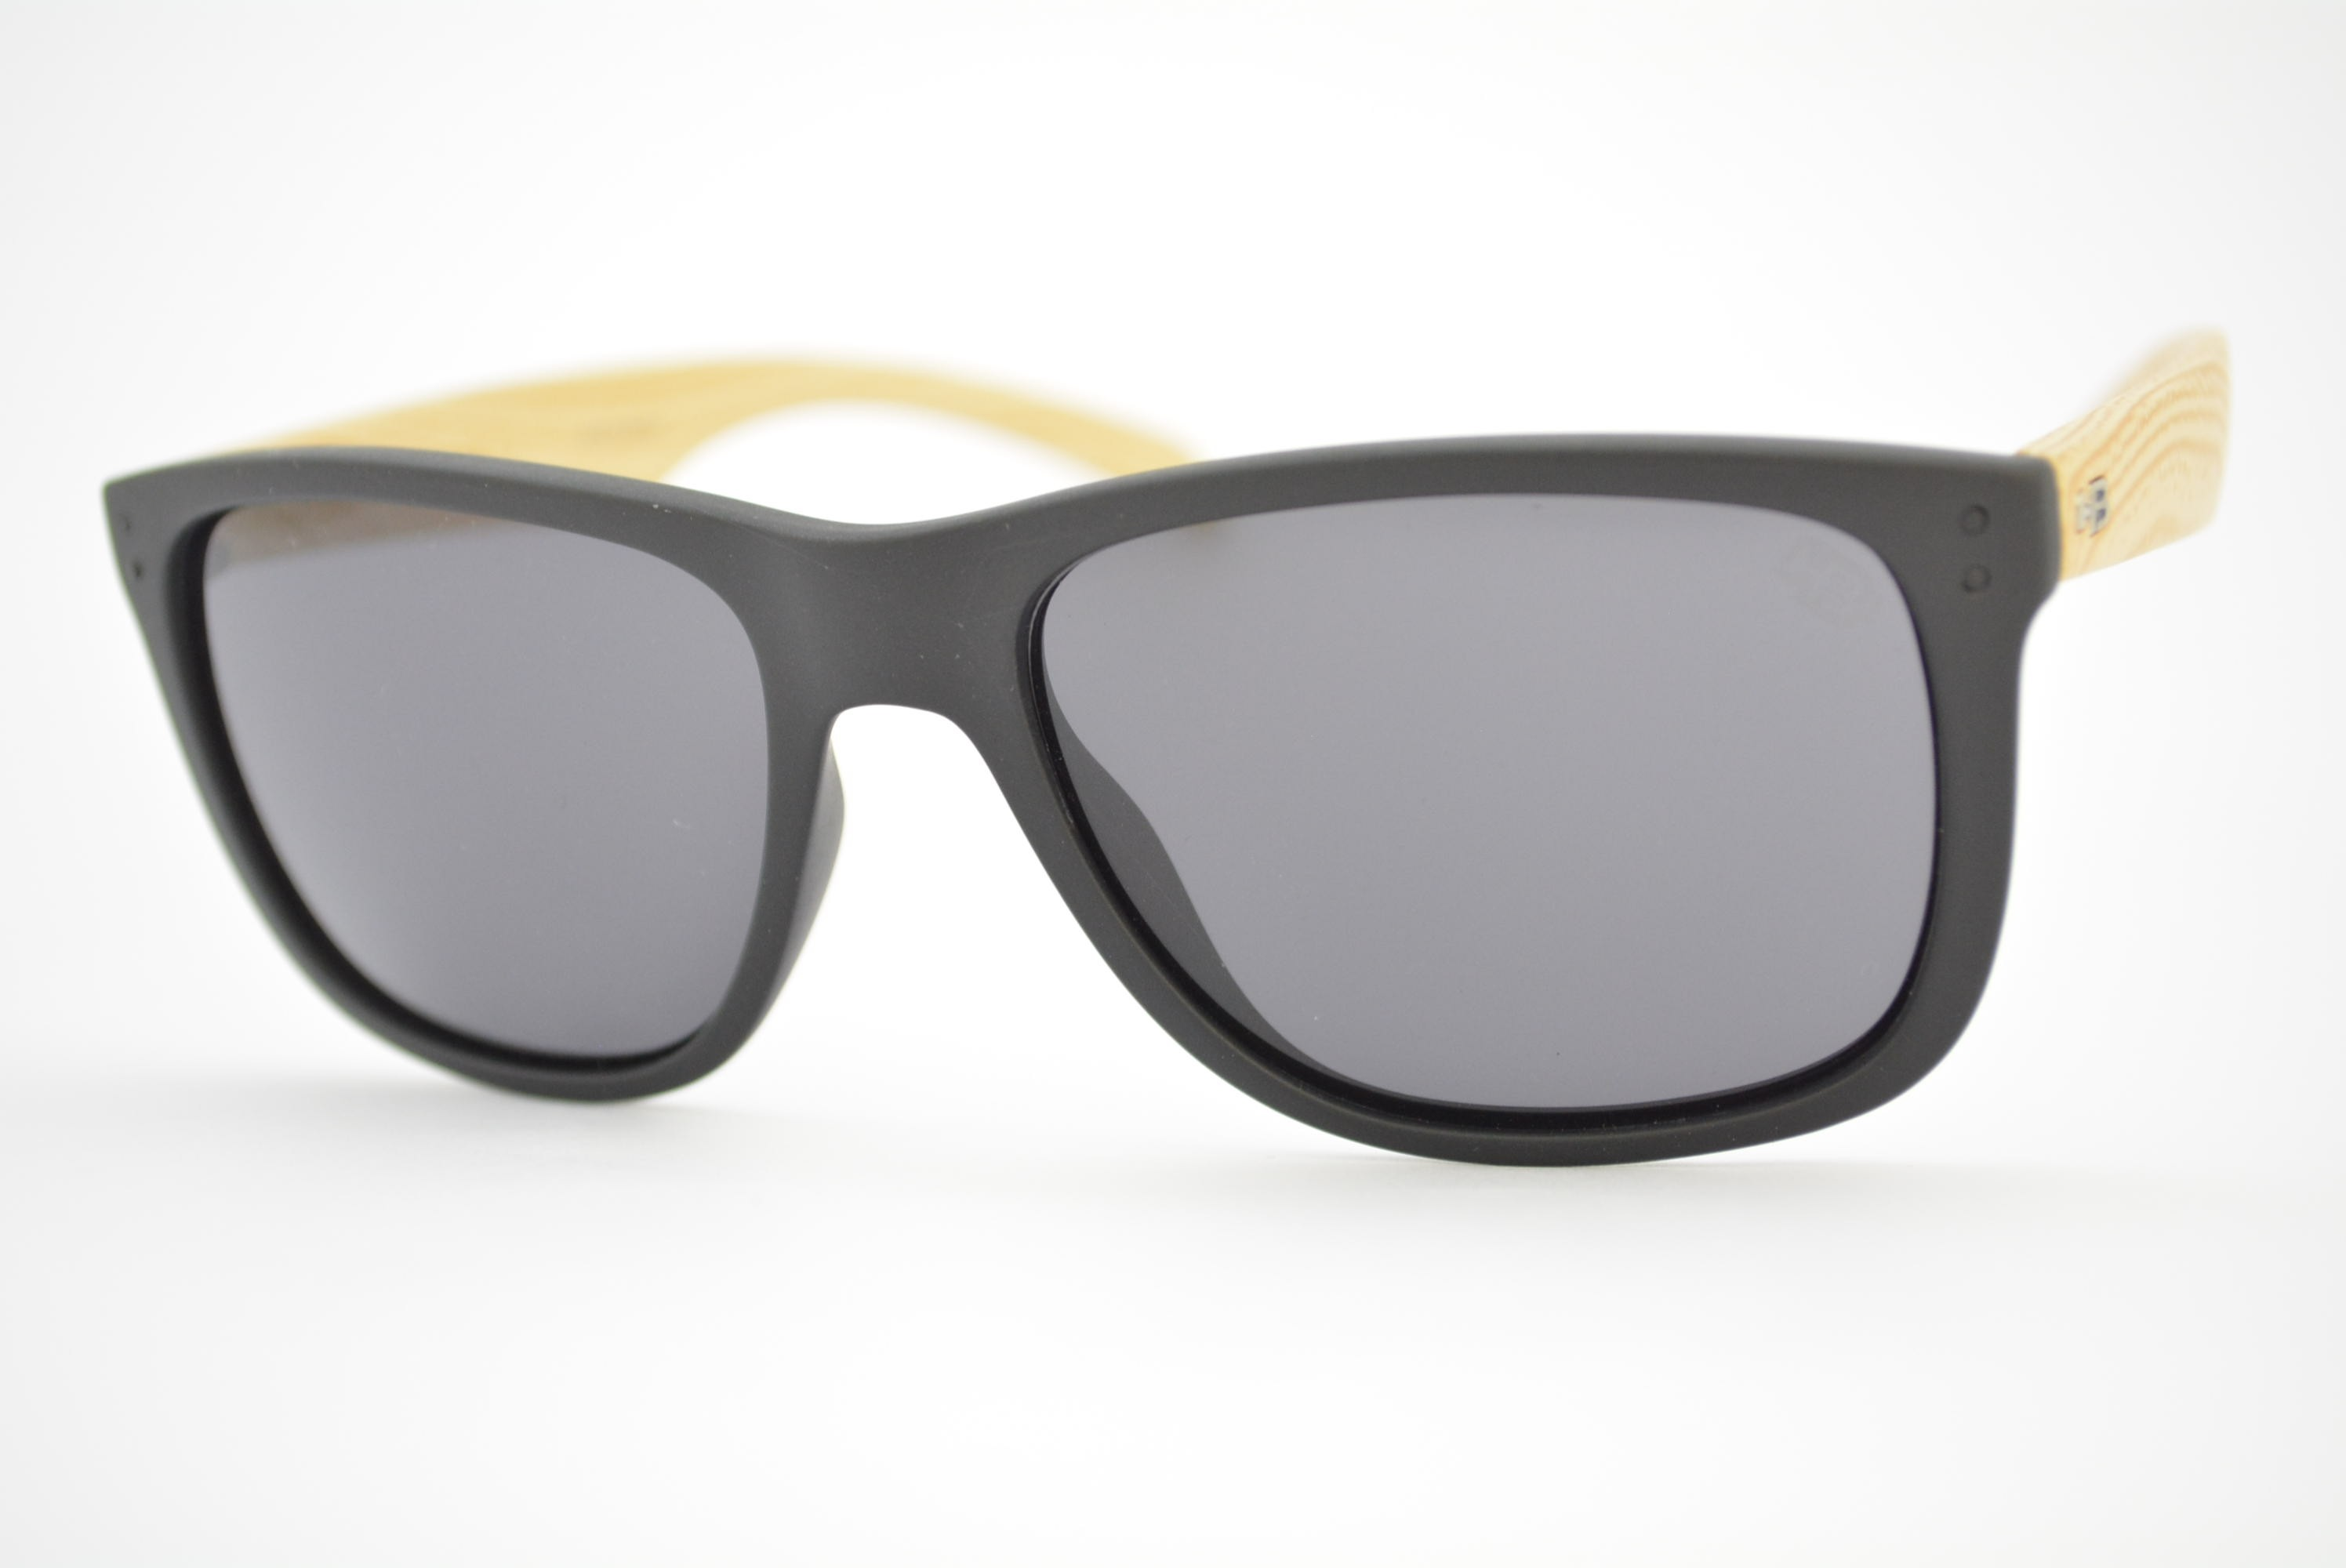 11ff98b1b óculos de sol HB mod Ozzie matte black wood gray 90140731 Ótica Cardoso